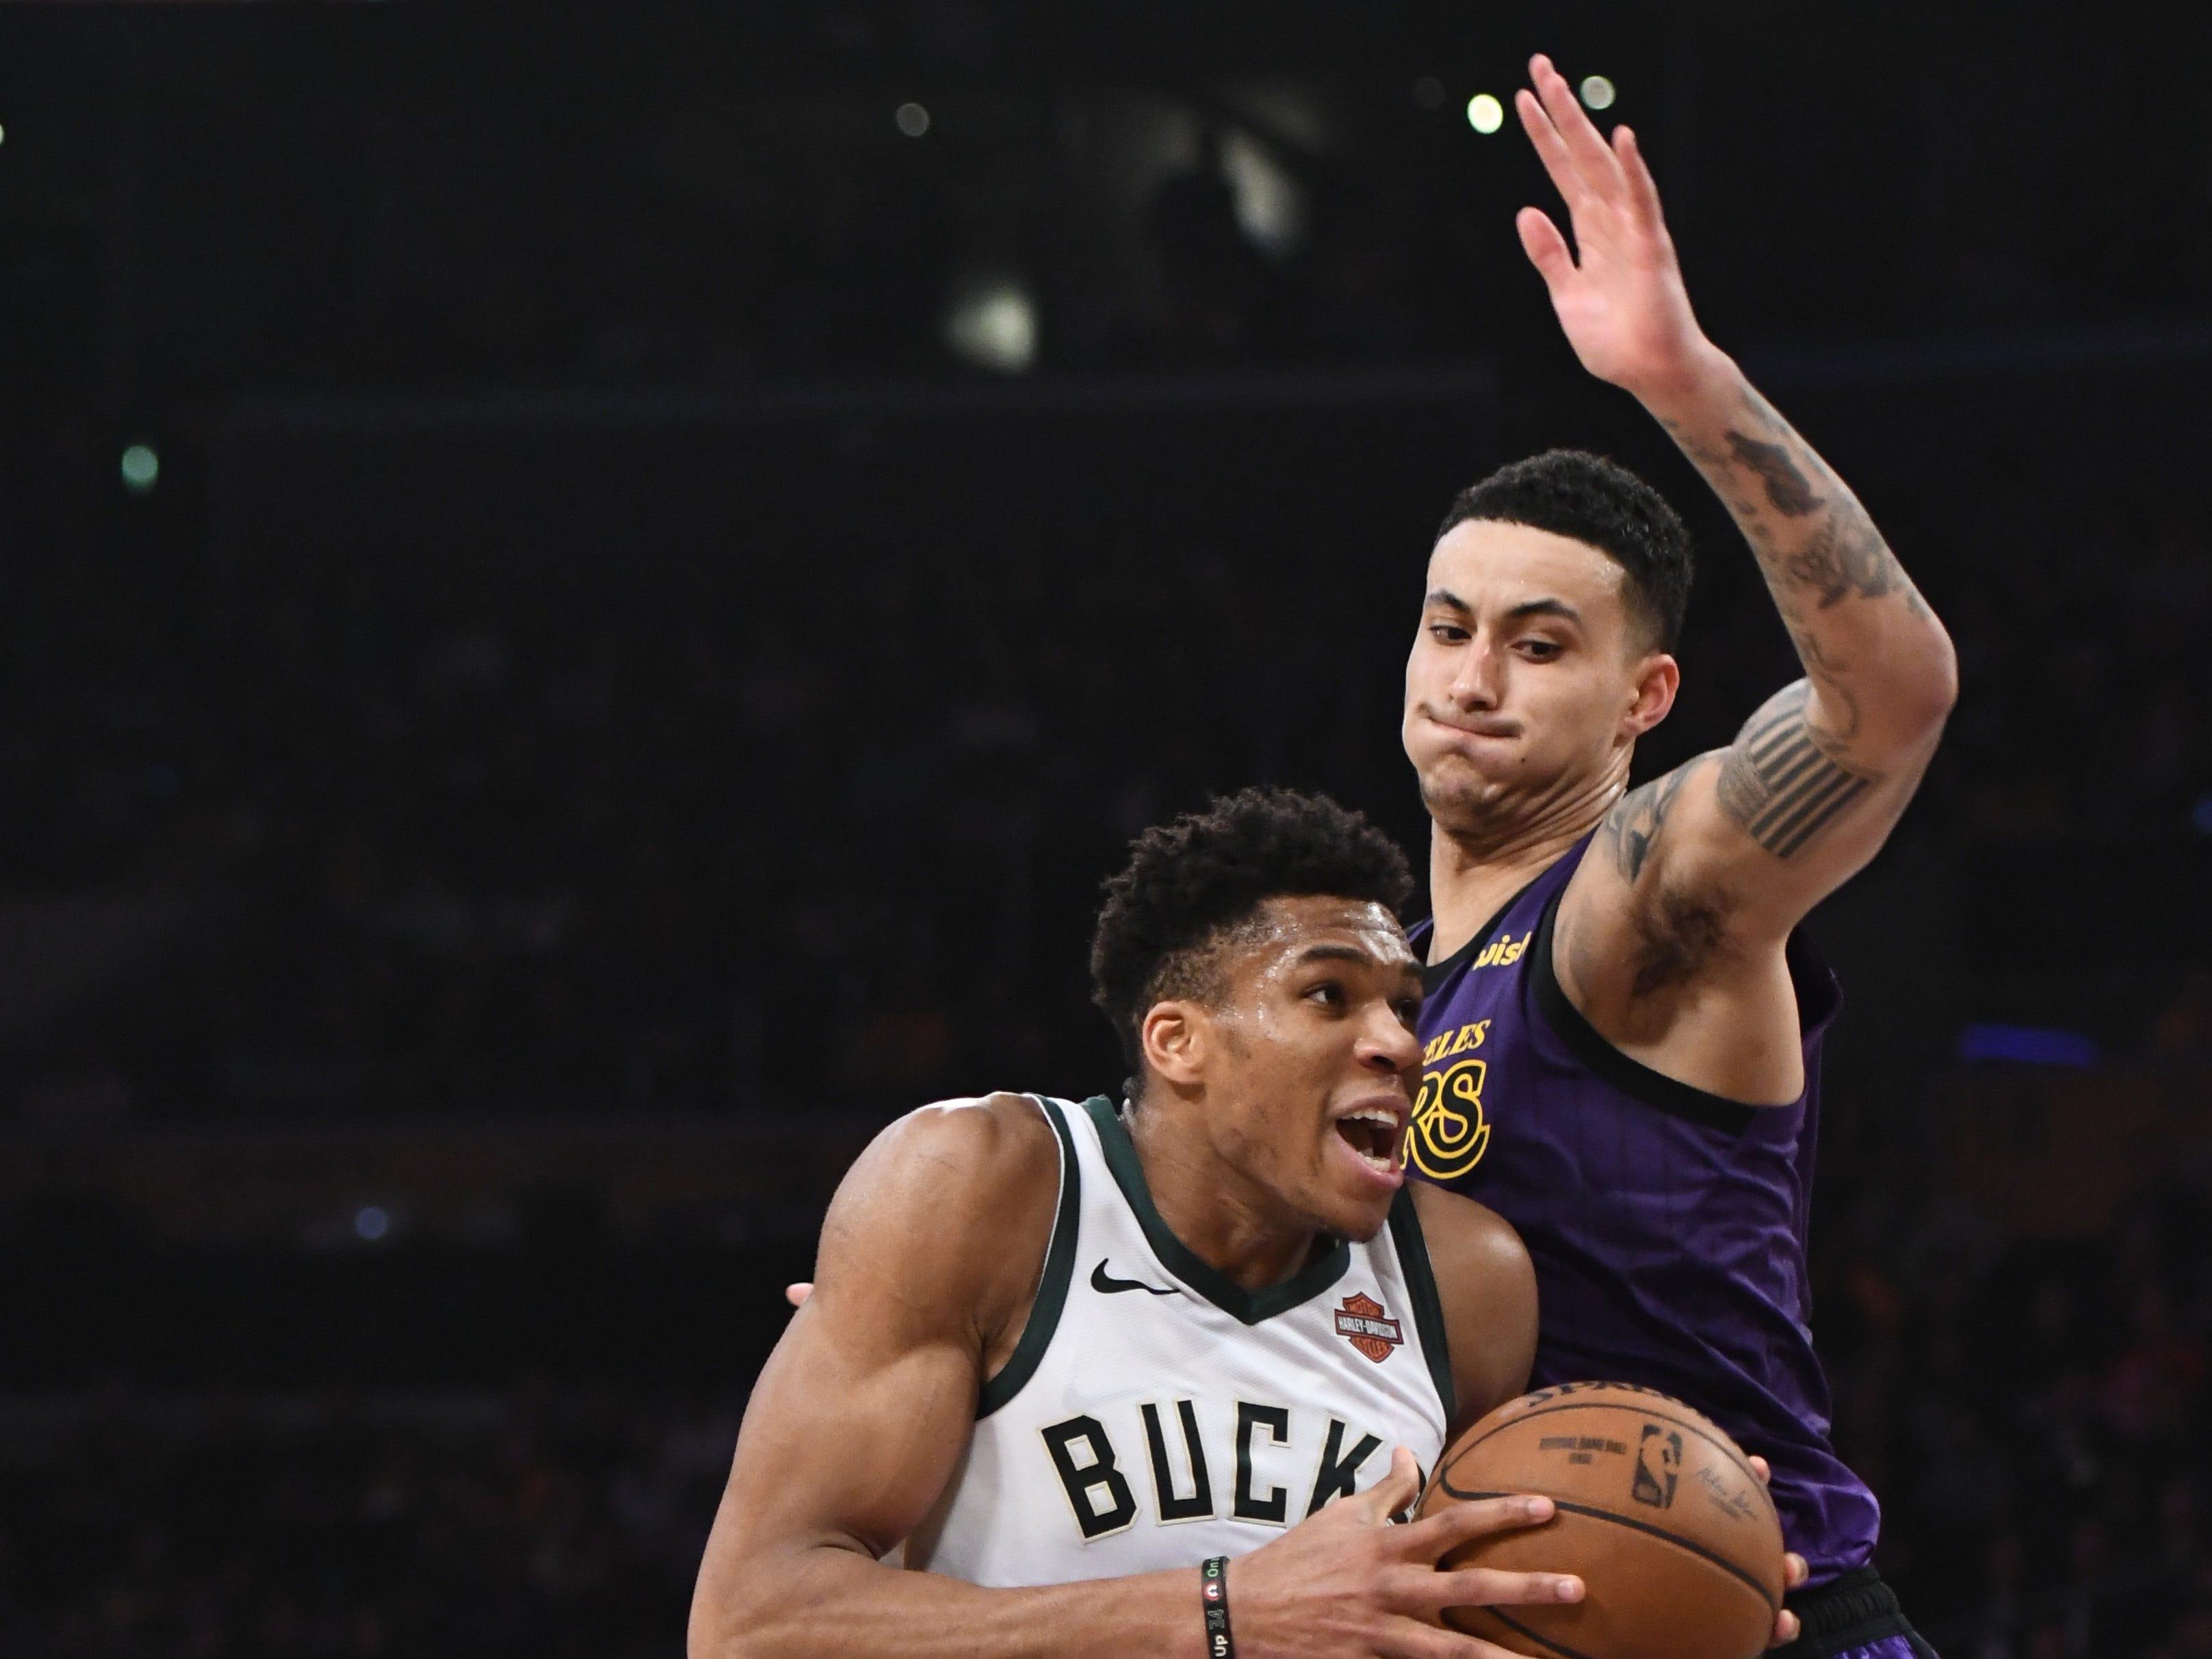 Bucks forward Giannis Antetokounmpo drivers to the basket against the tight defense of Lakers forward Kyle Kuzma during the third quarter.